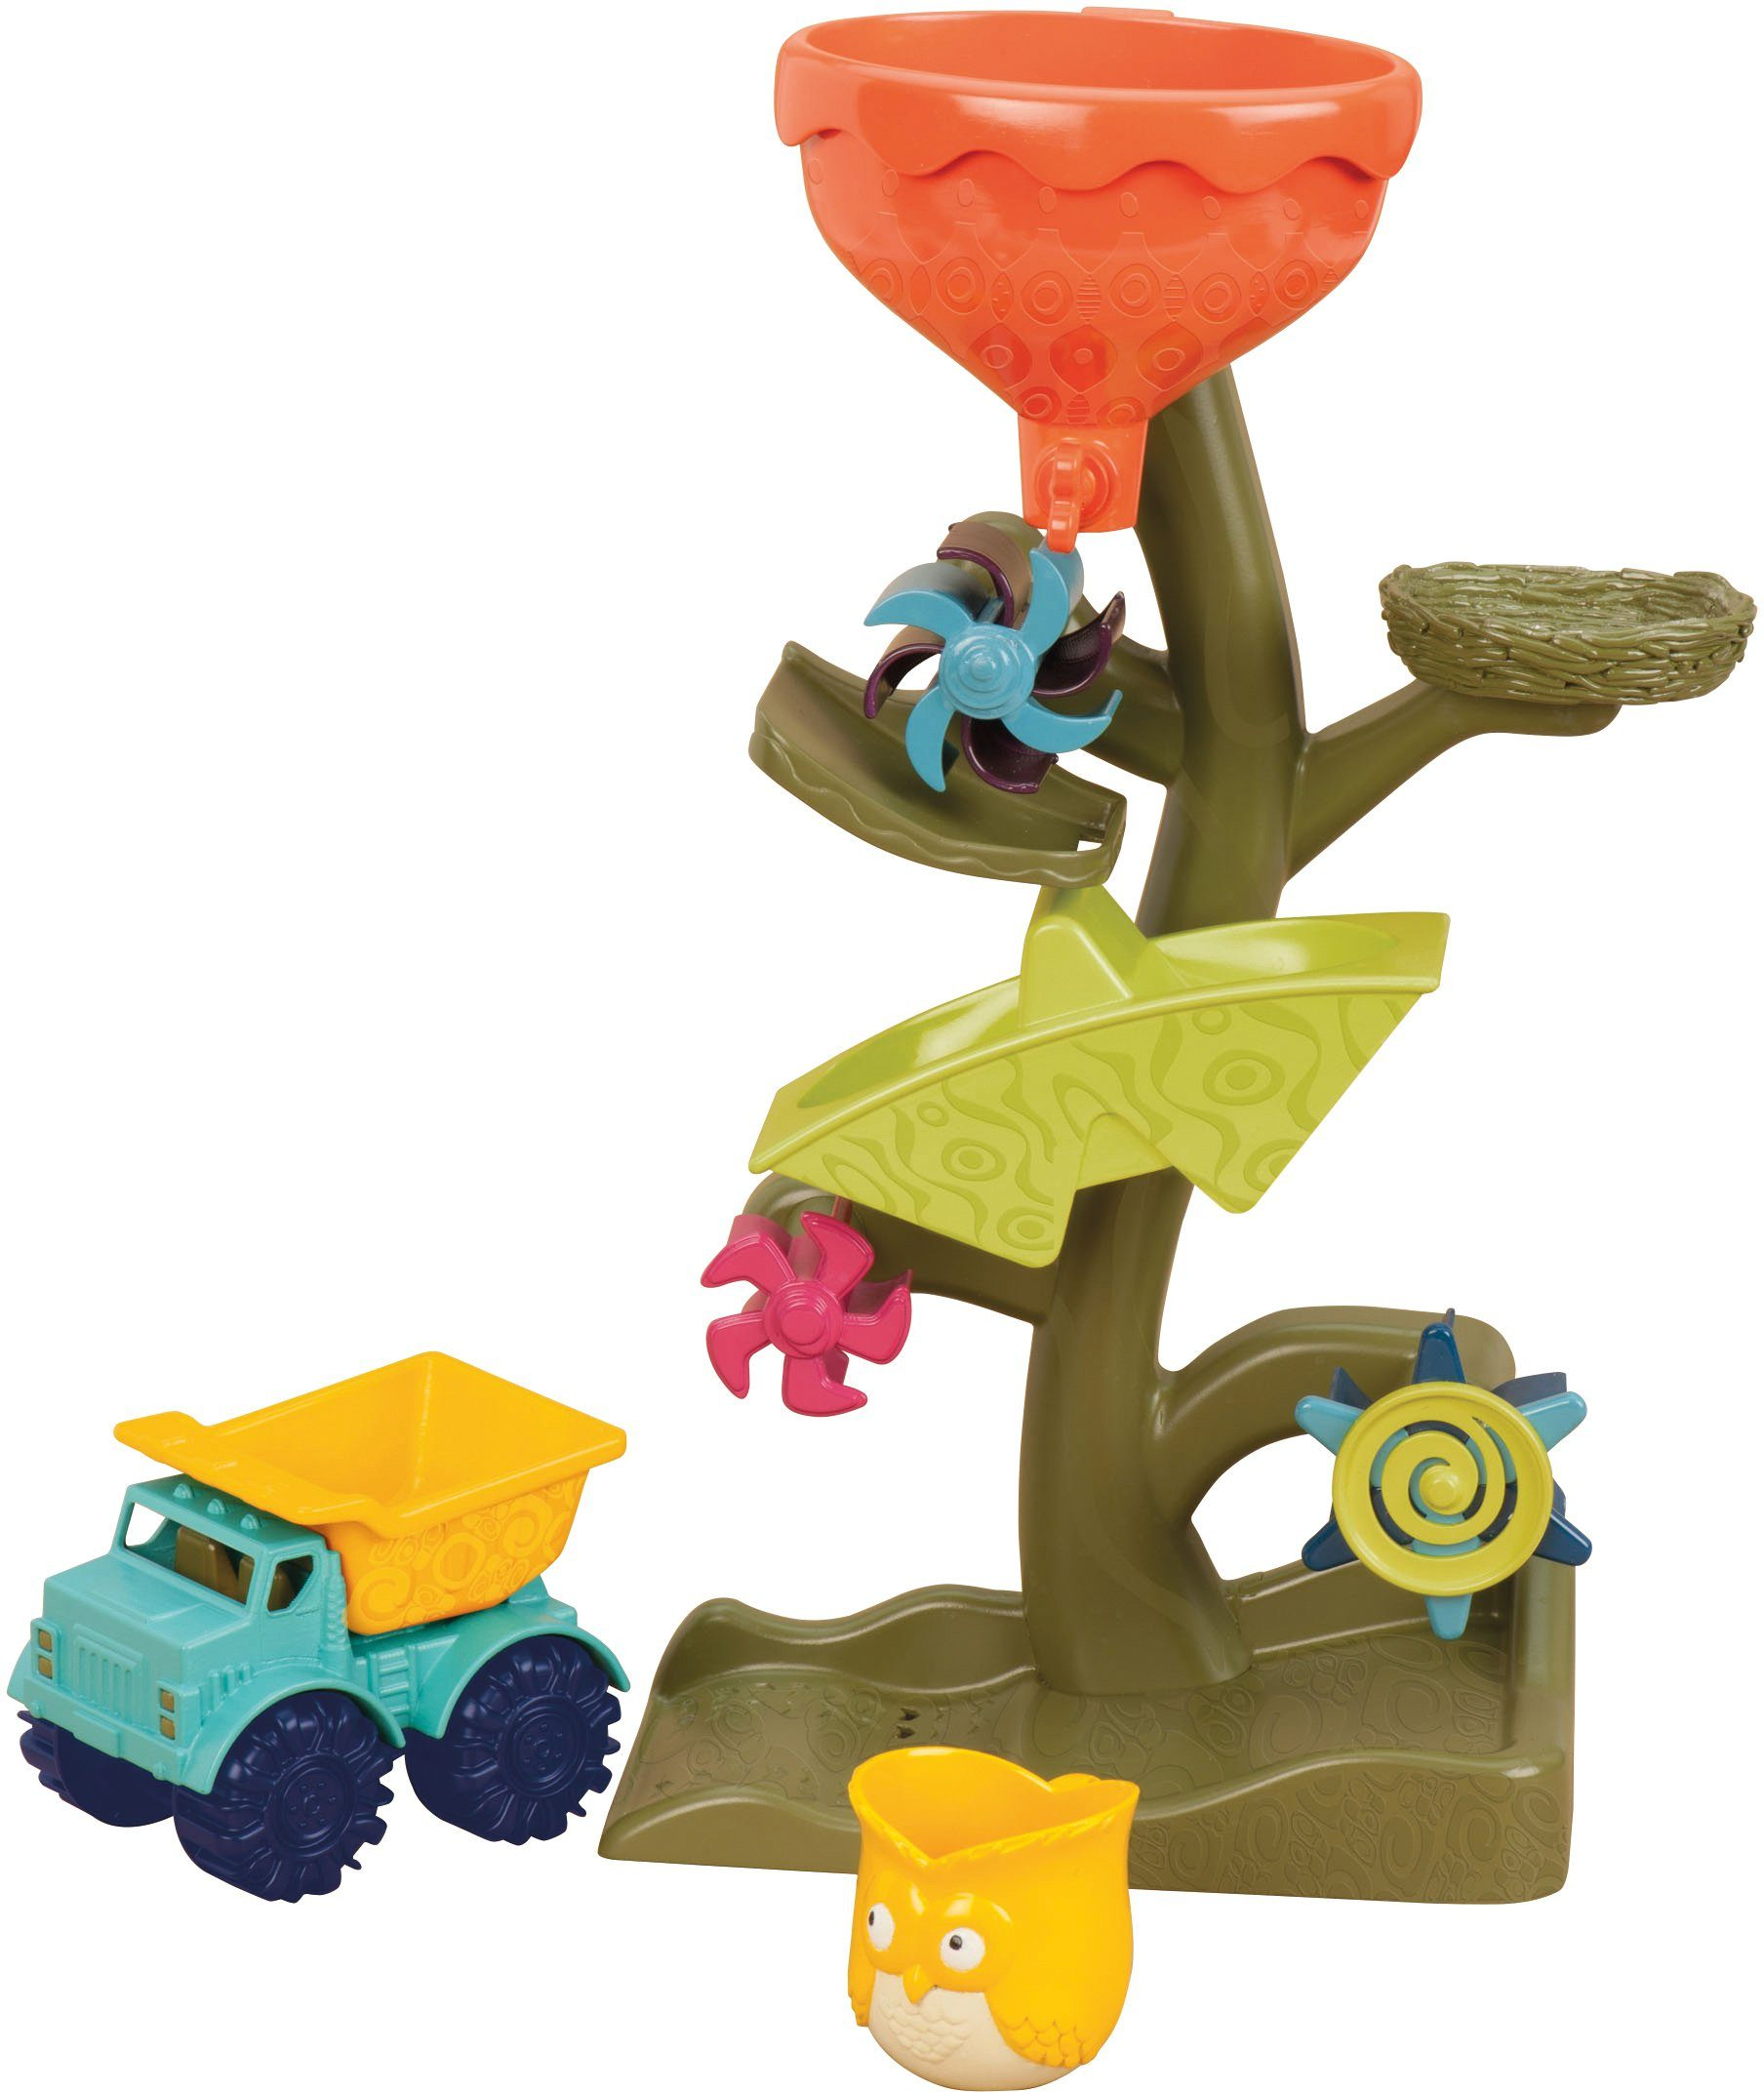 B.toys Badewannenspielzeug, »Owl About Waterfalls«